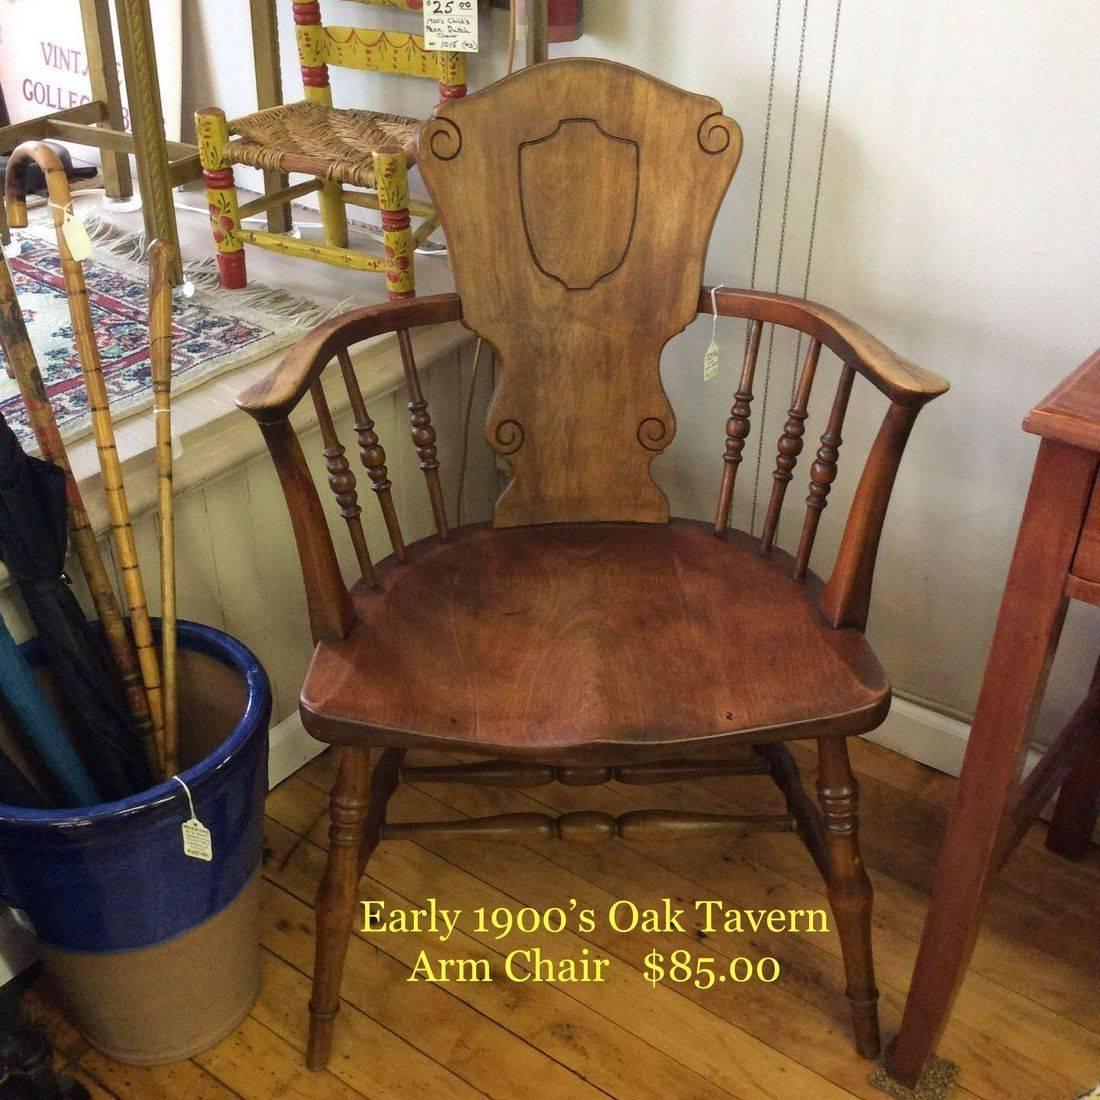 Early 1900's Oak Tavern Arm Chair   $85.00